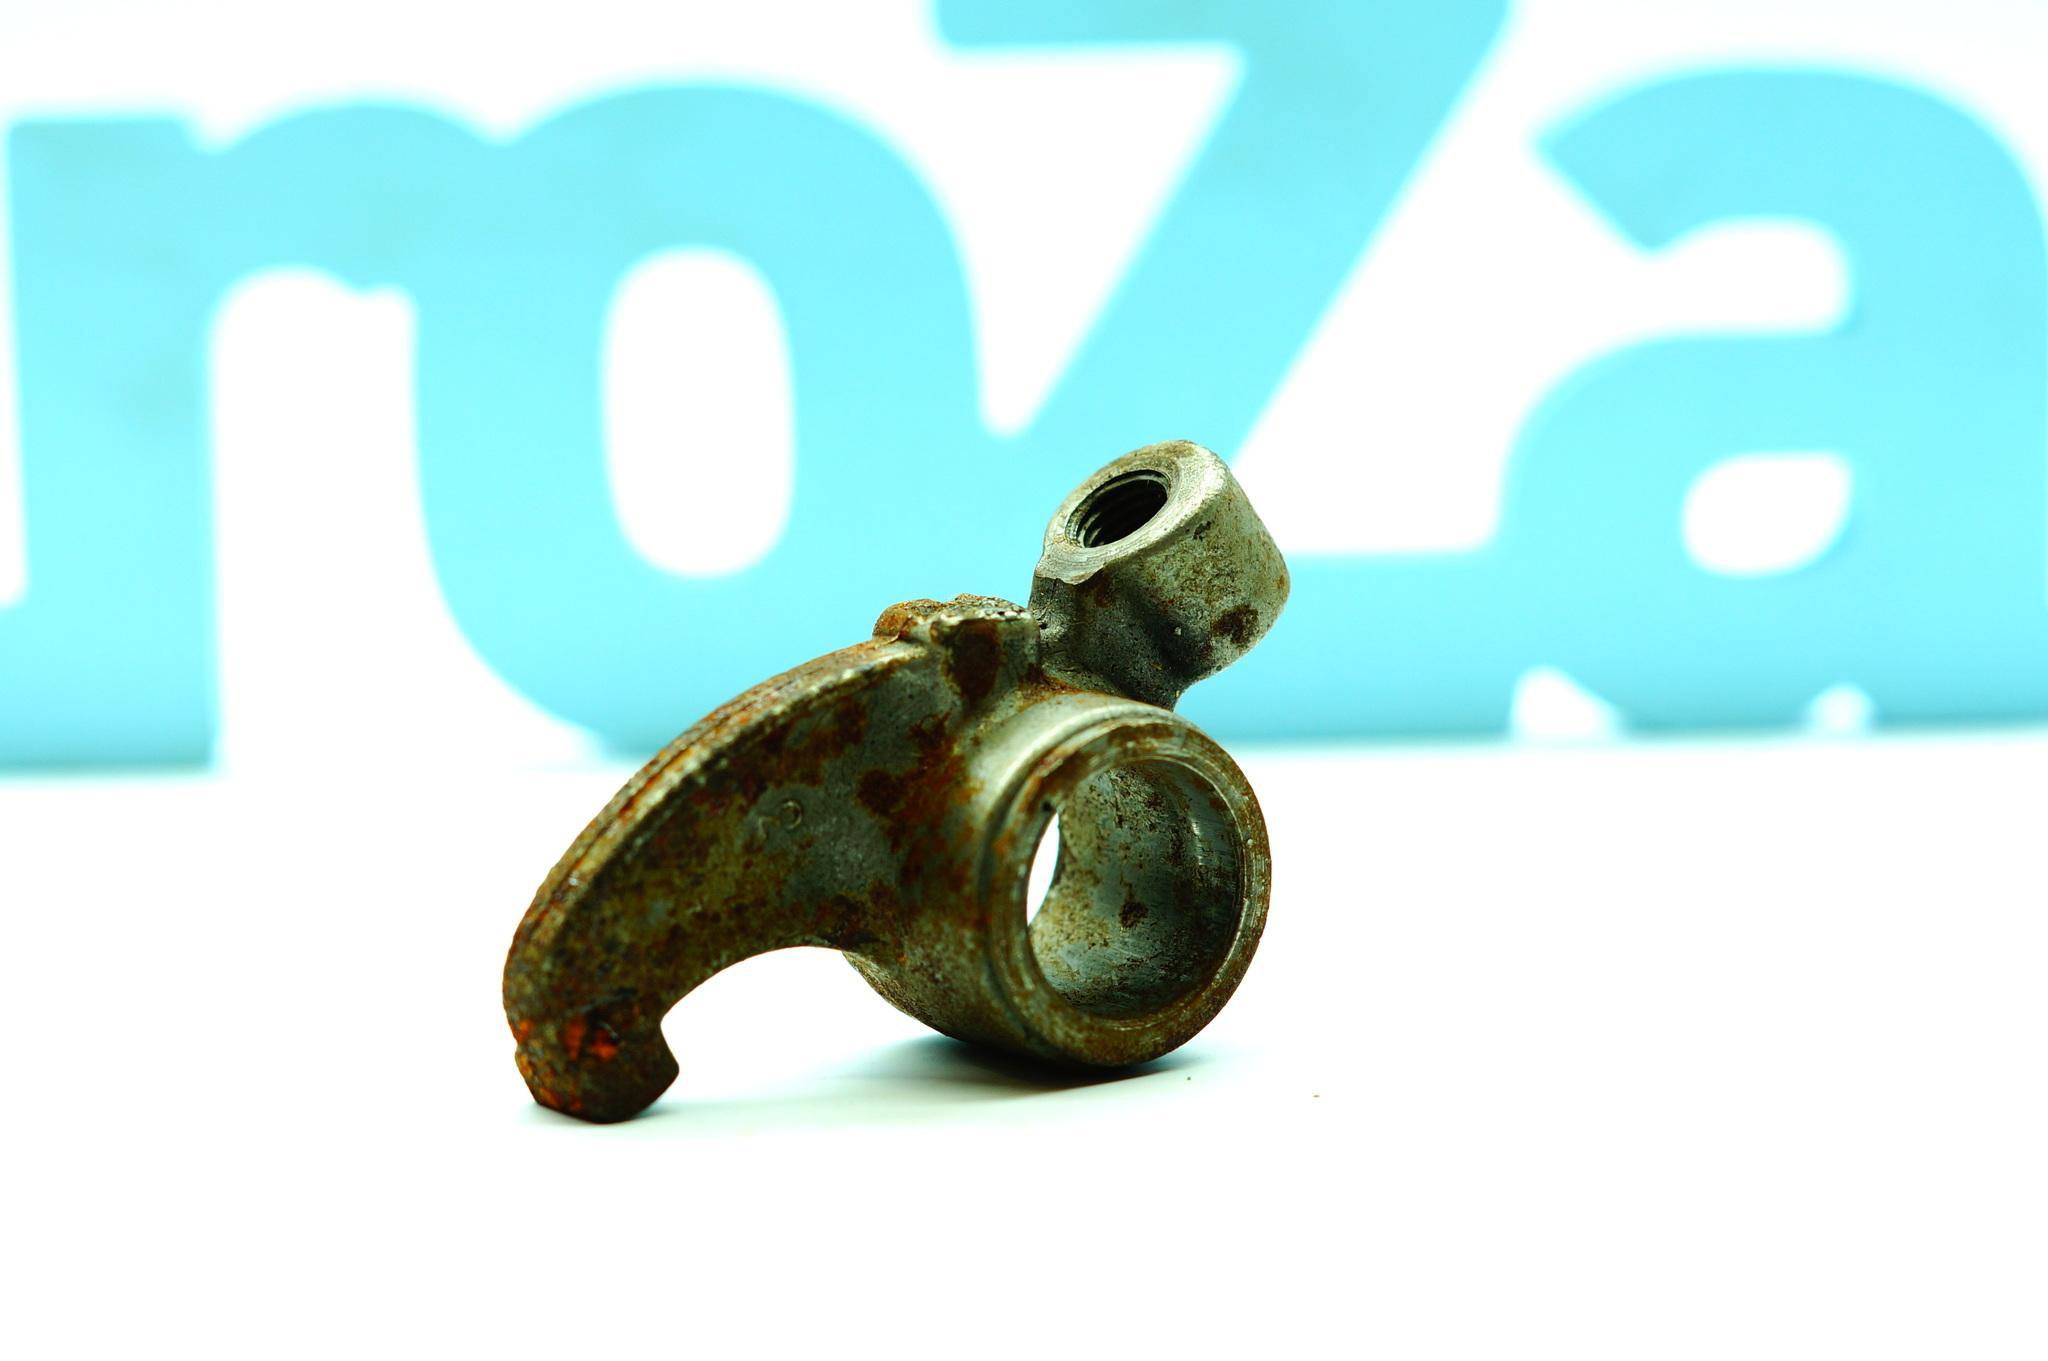 Коромысло клапана ЗАЗ 968, ЛуаЗ